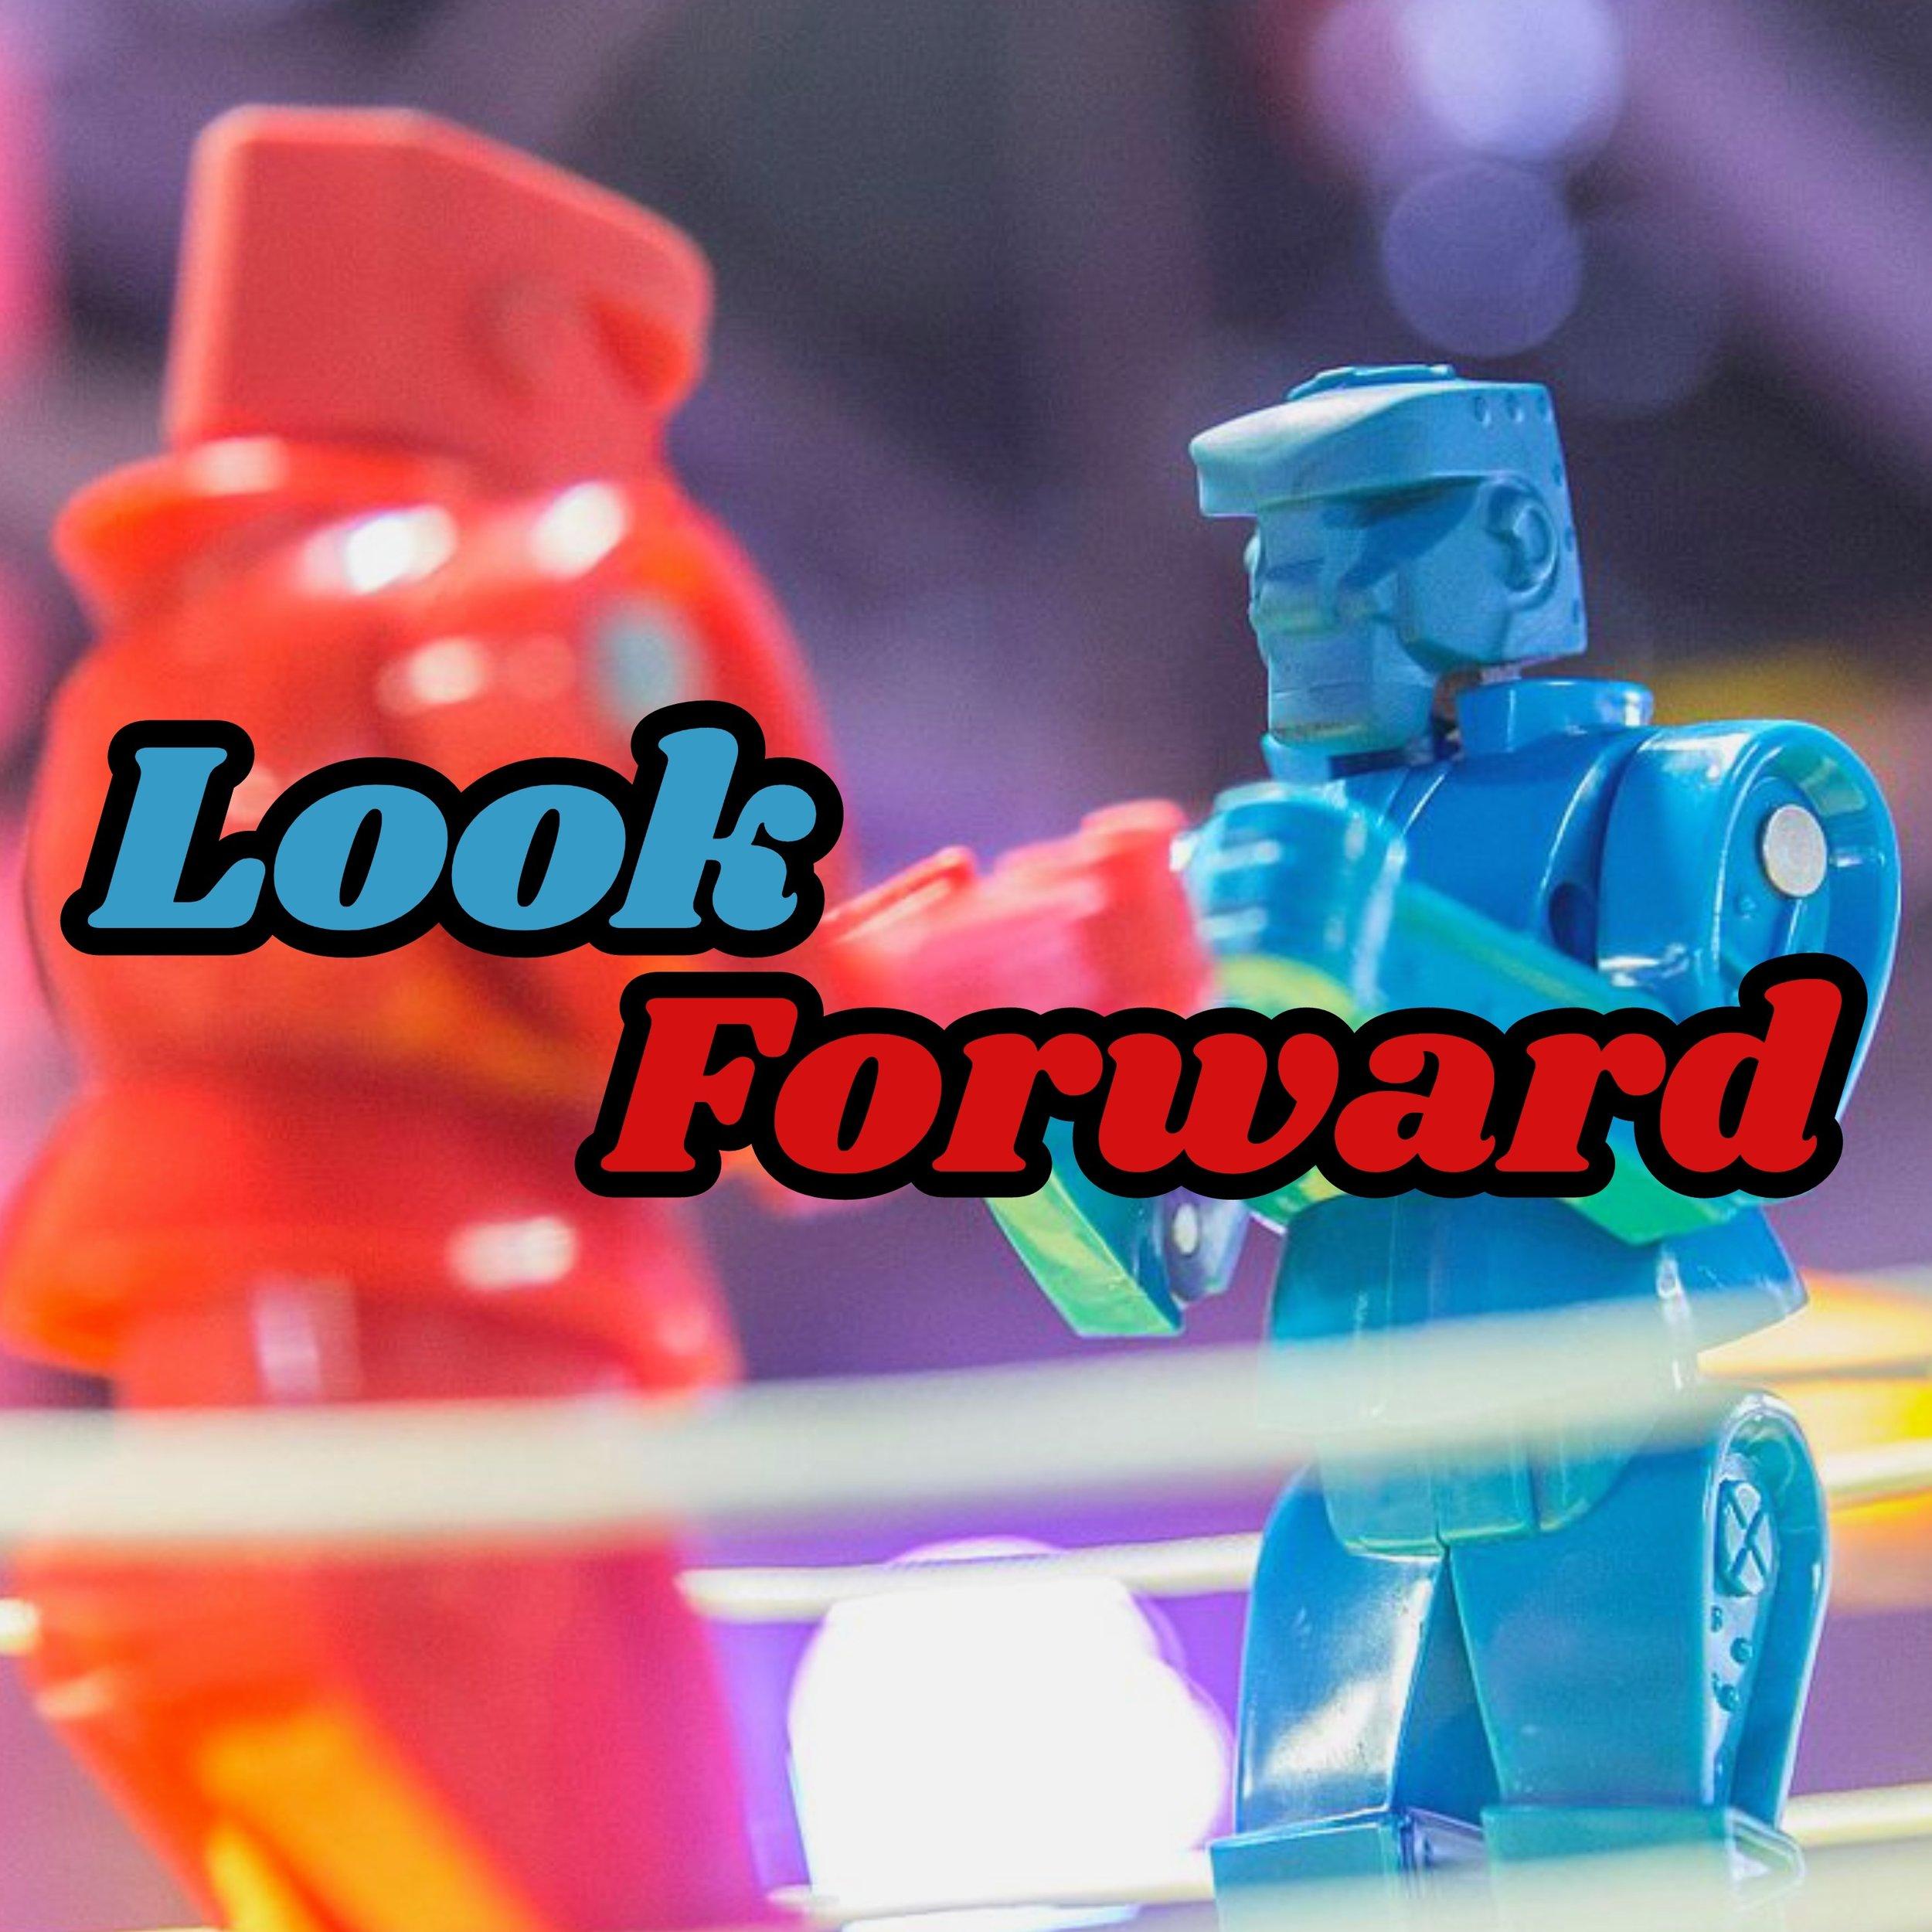 LookForwardLogo.jpg